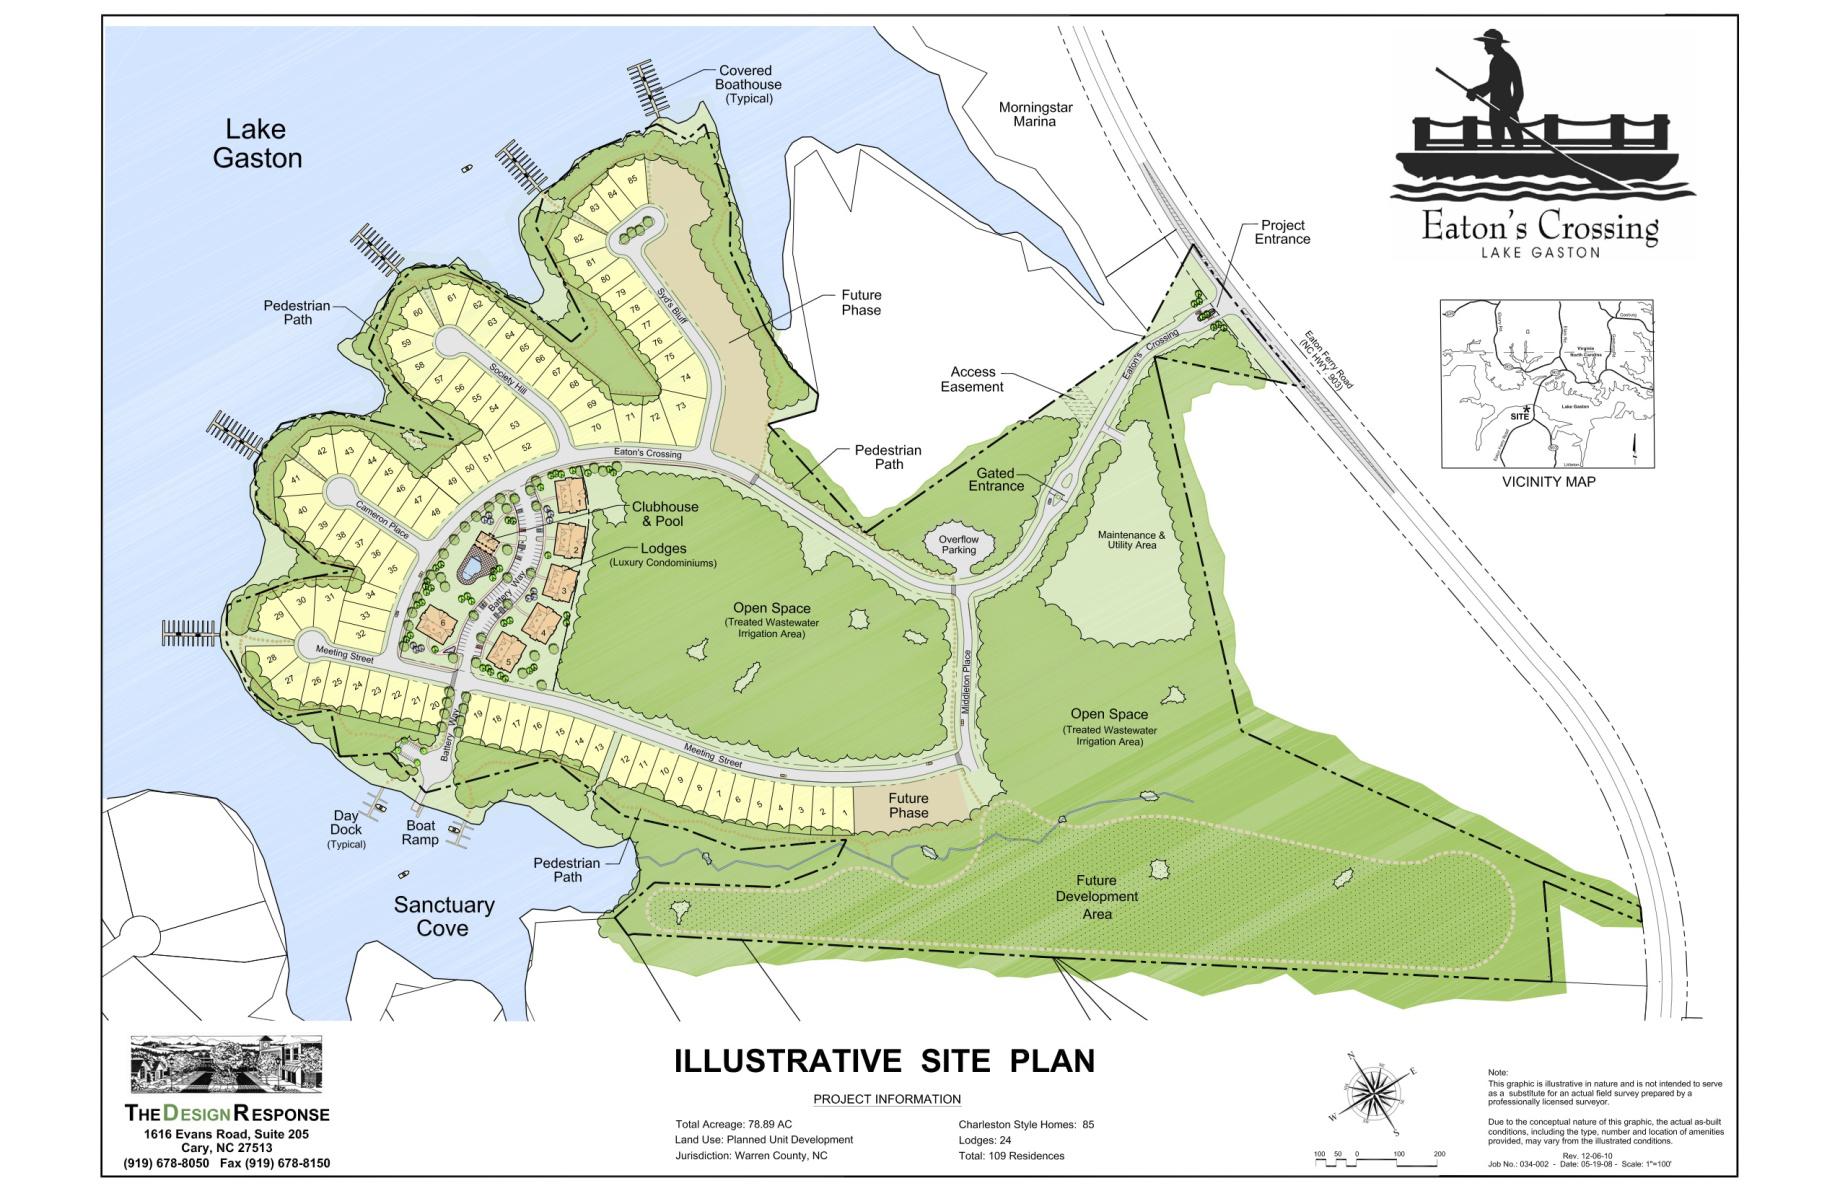 eatons-crossing-illustrative-site-plan-12-6-10.jpg